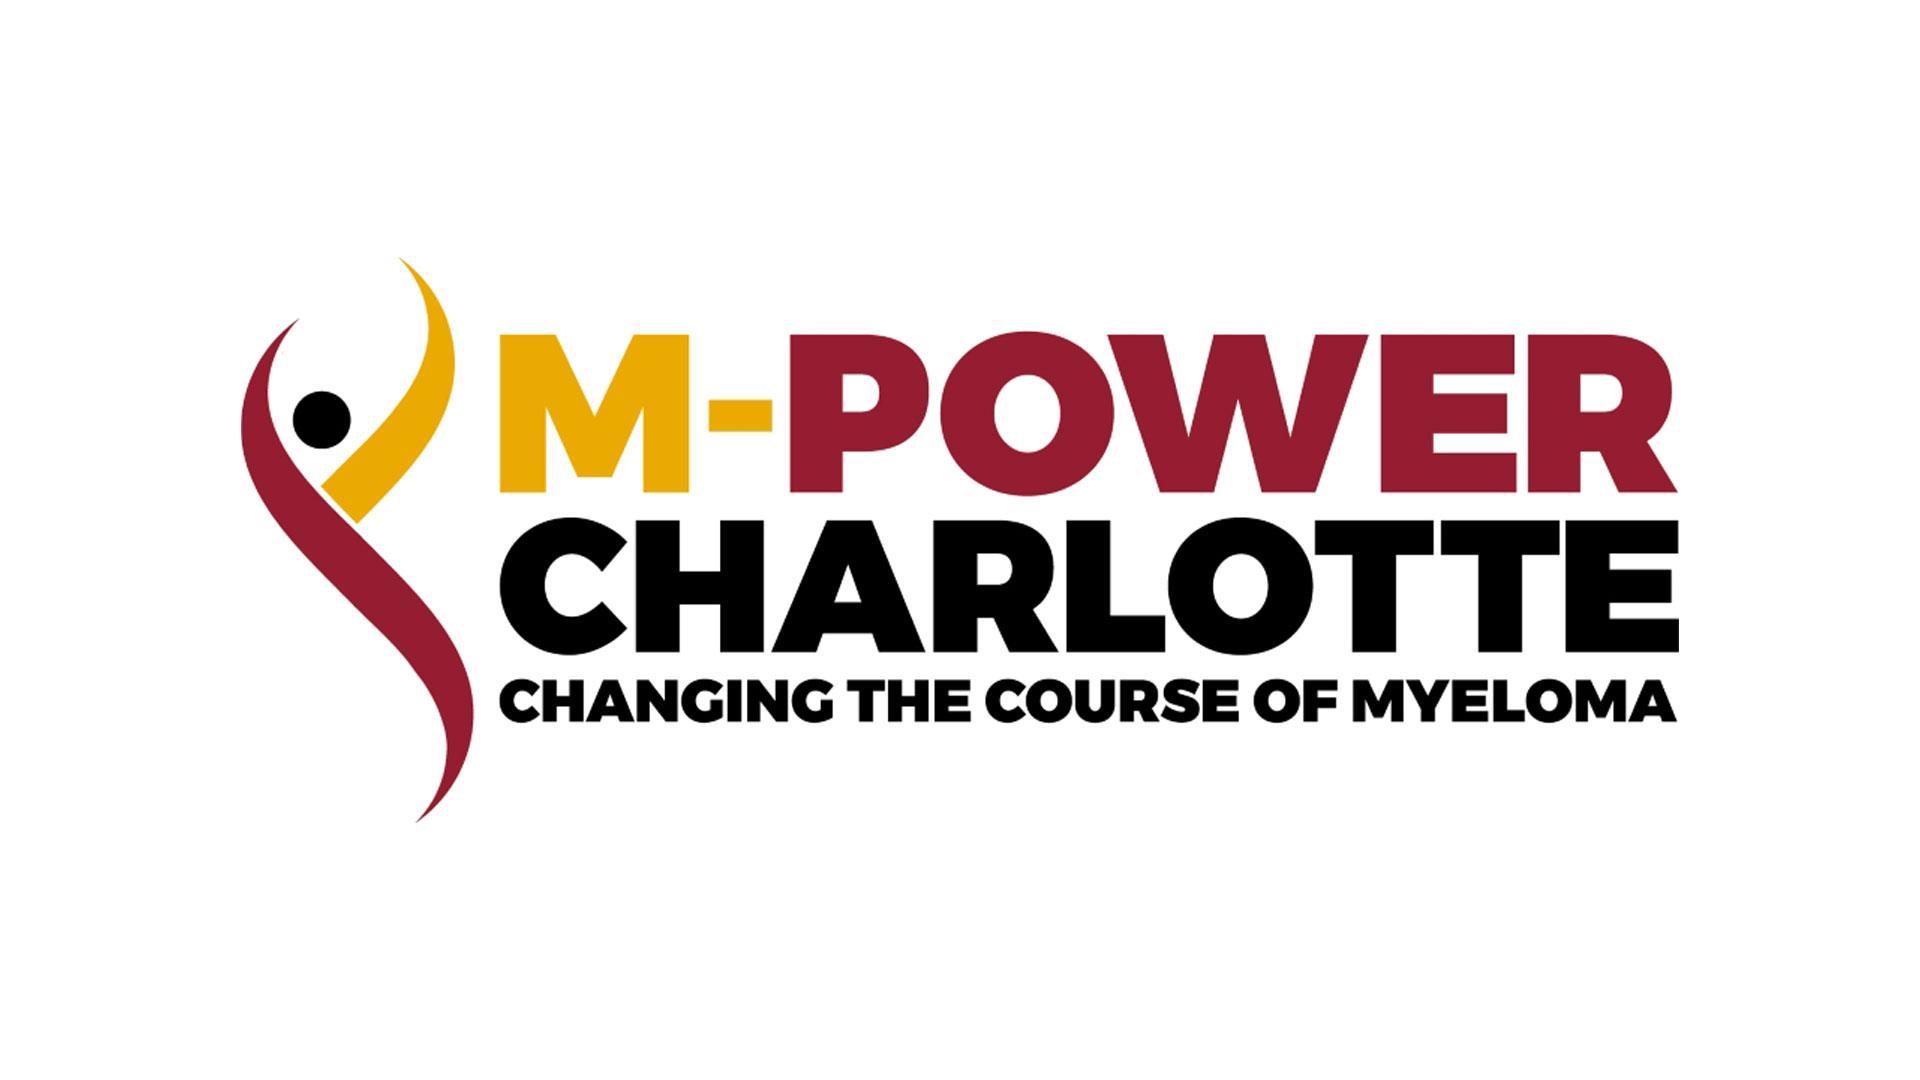 m power charlotte logo